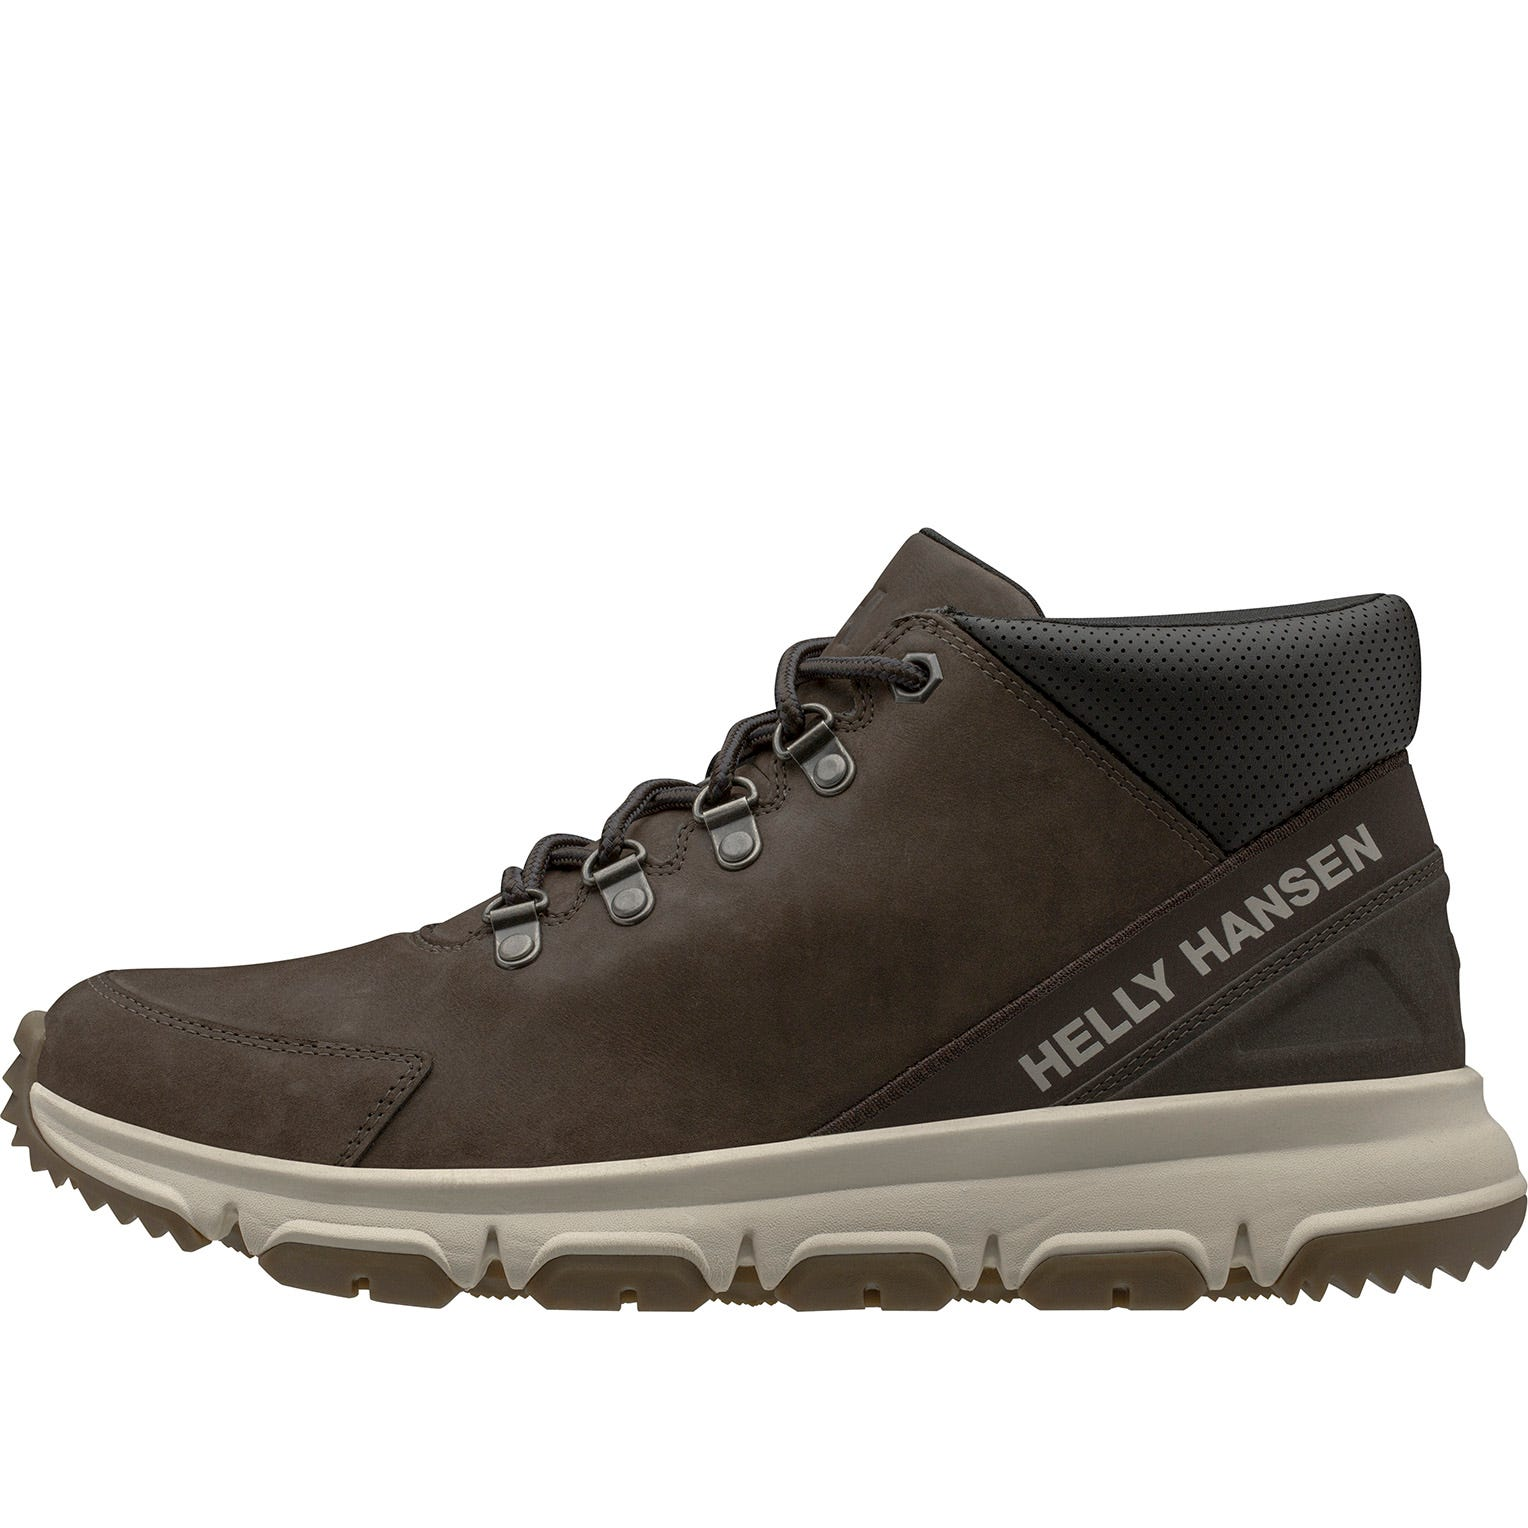 Helly Hansen Mens Fendvard Waterproof Leather Boots 7.5